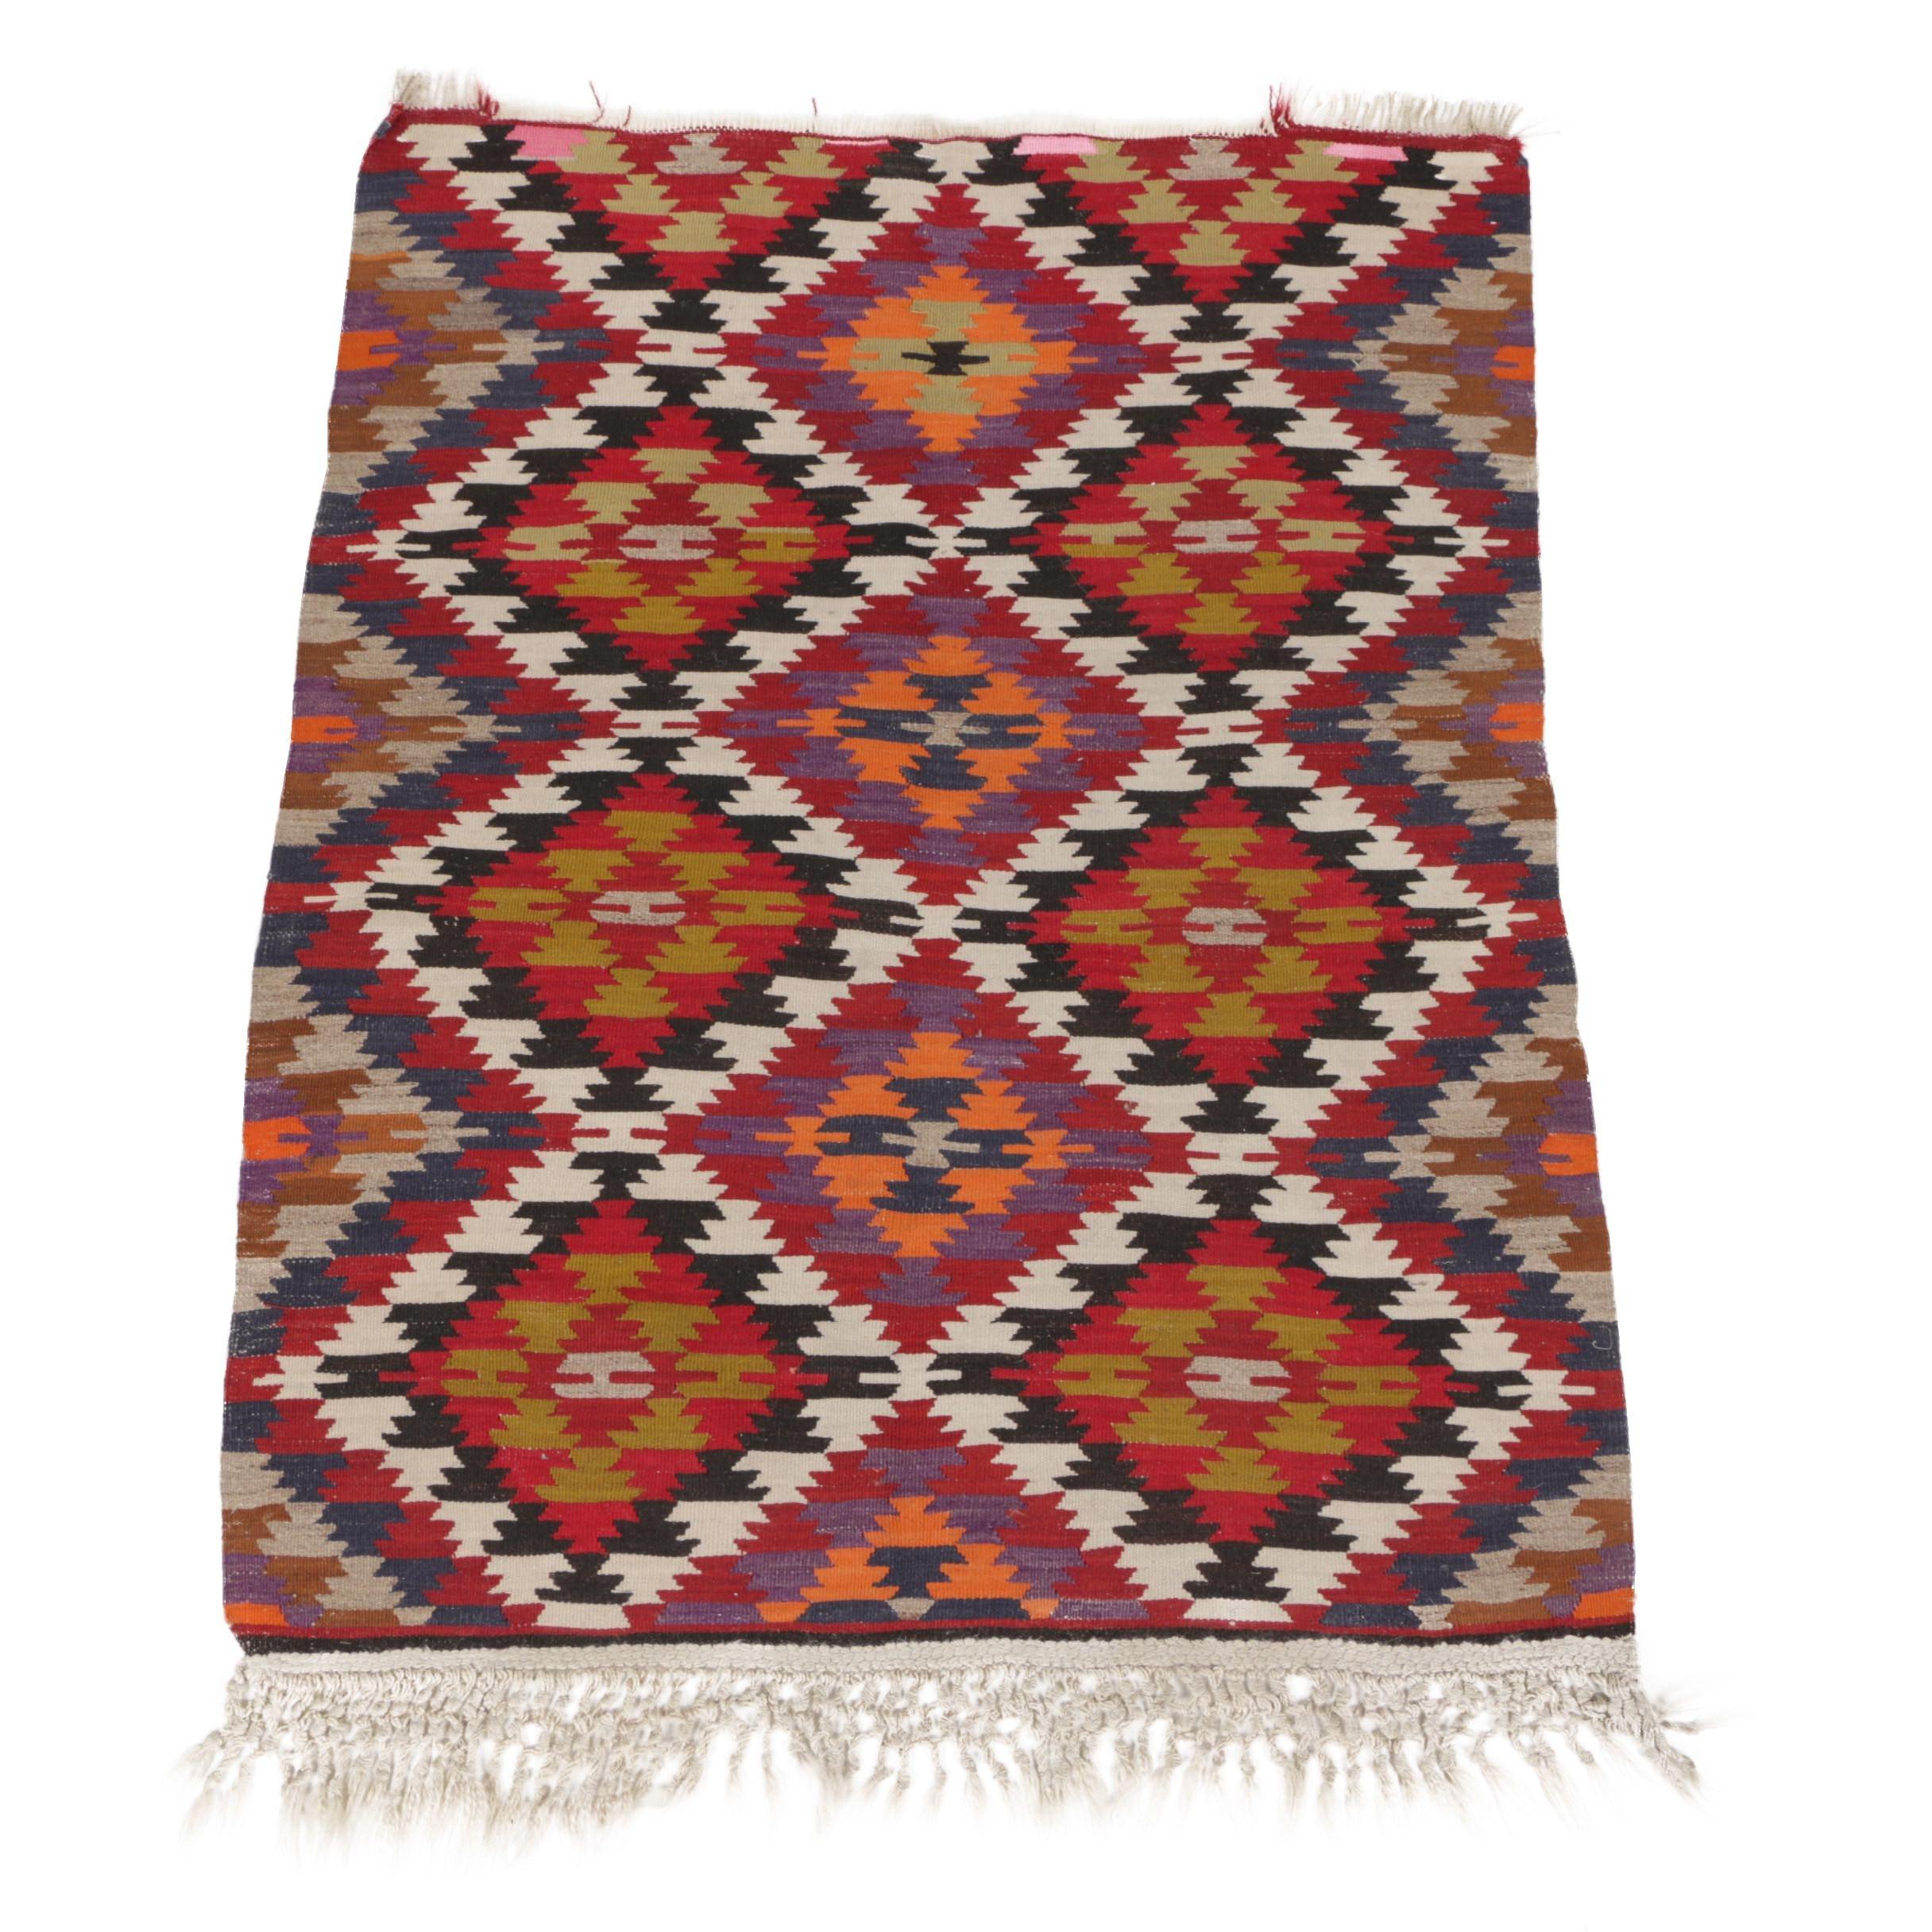 Handwoven Turkish Kilim Wool Accent Rug